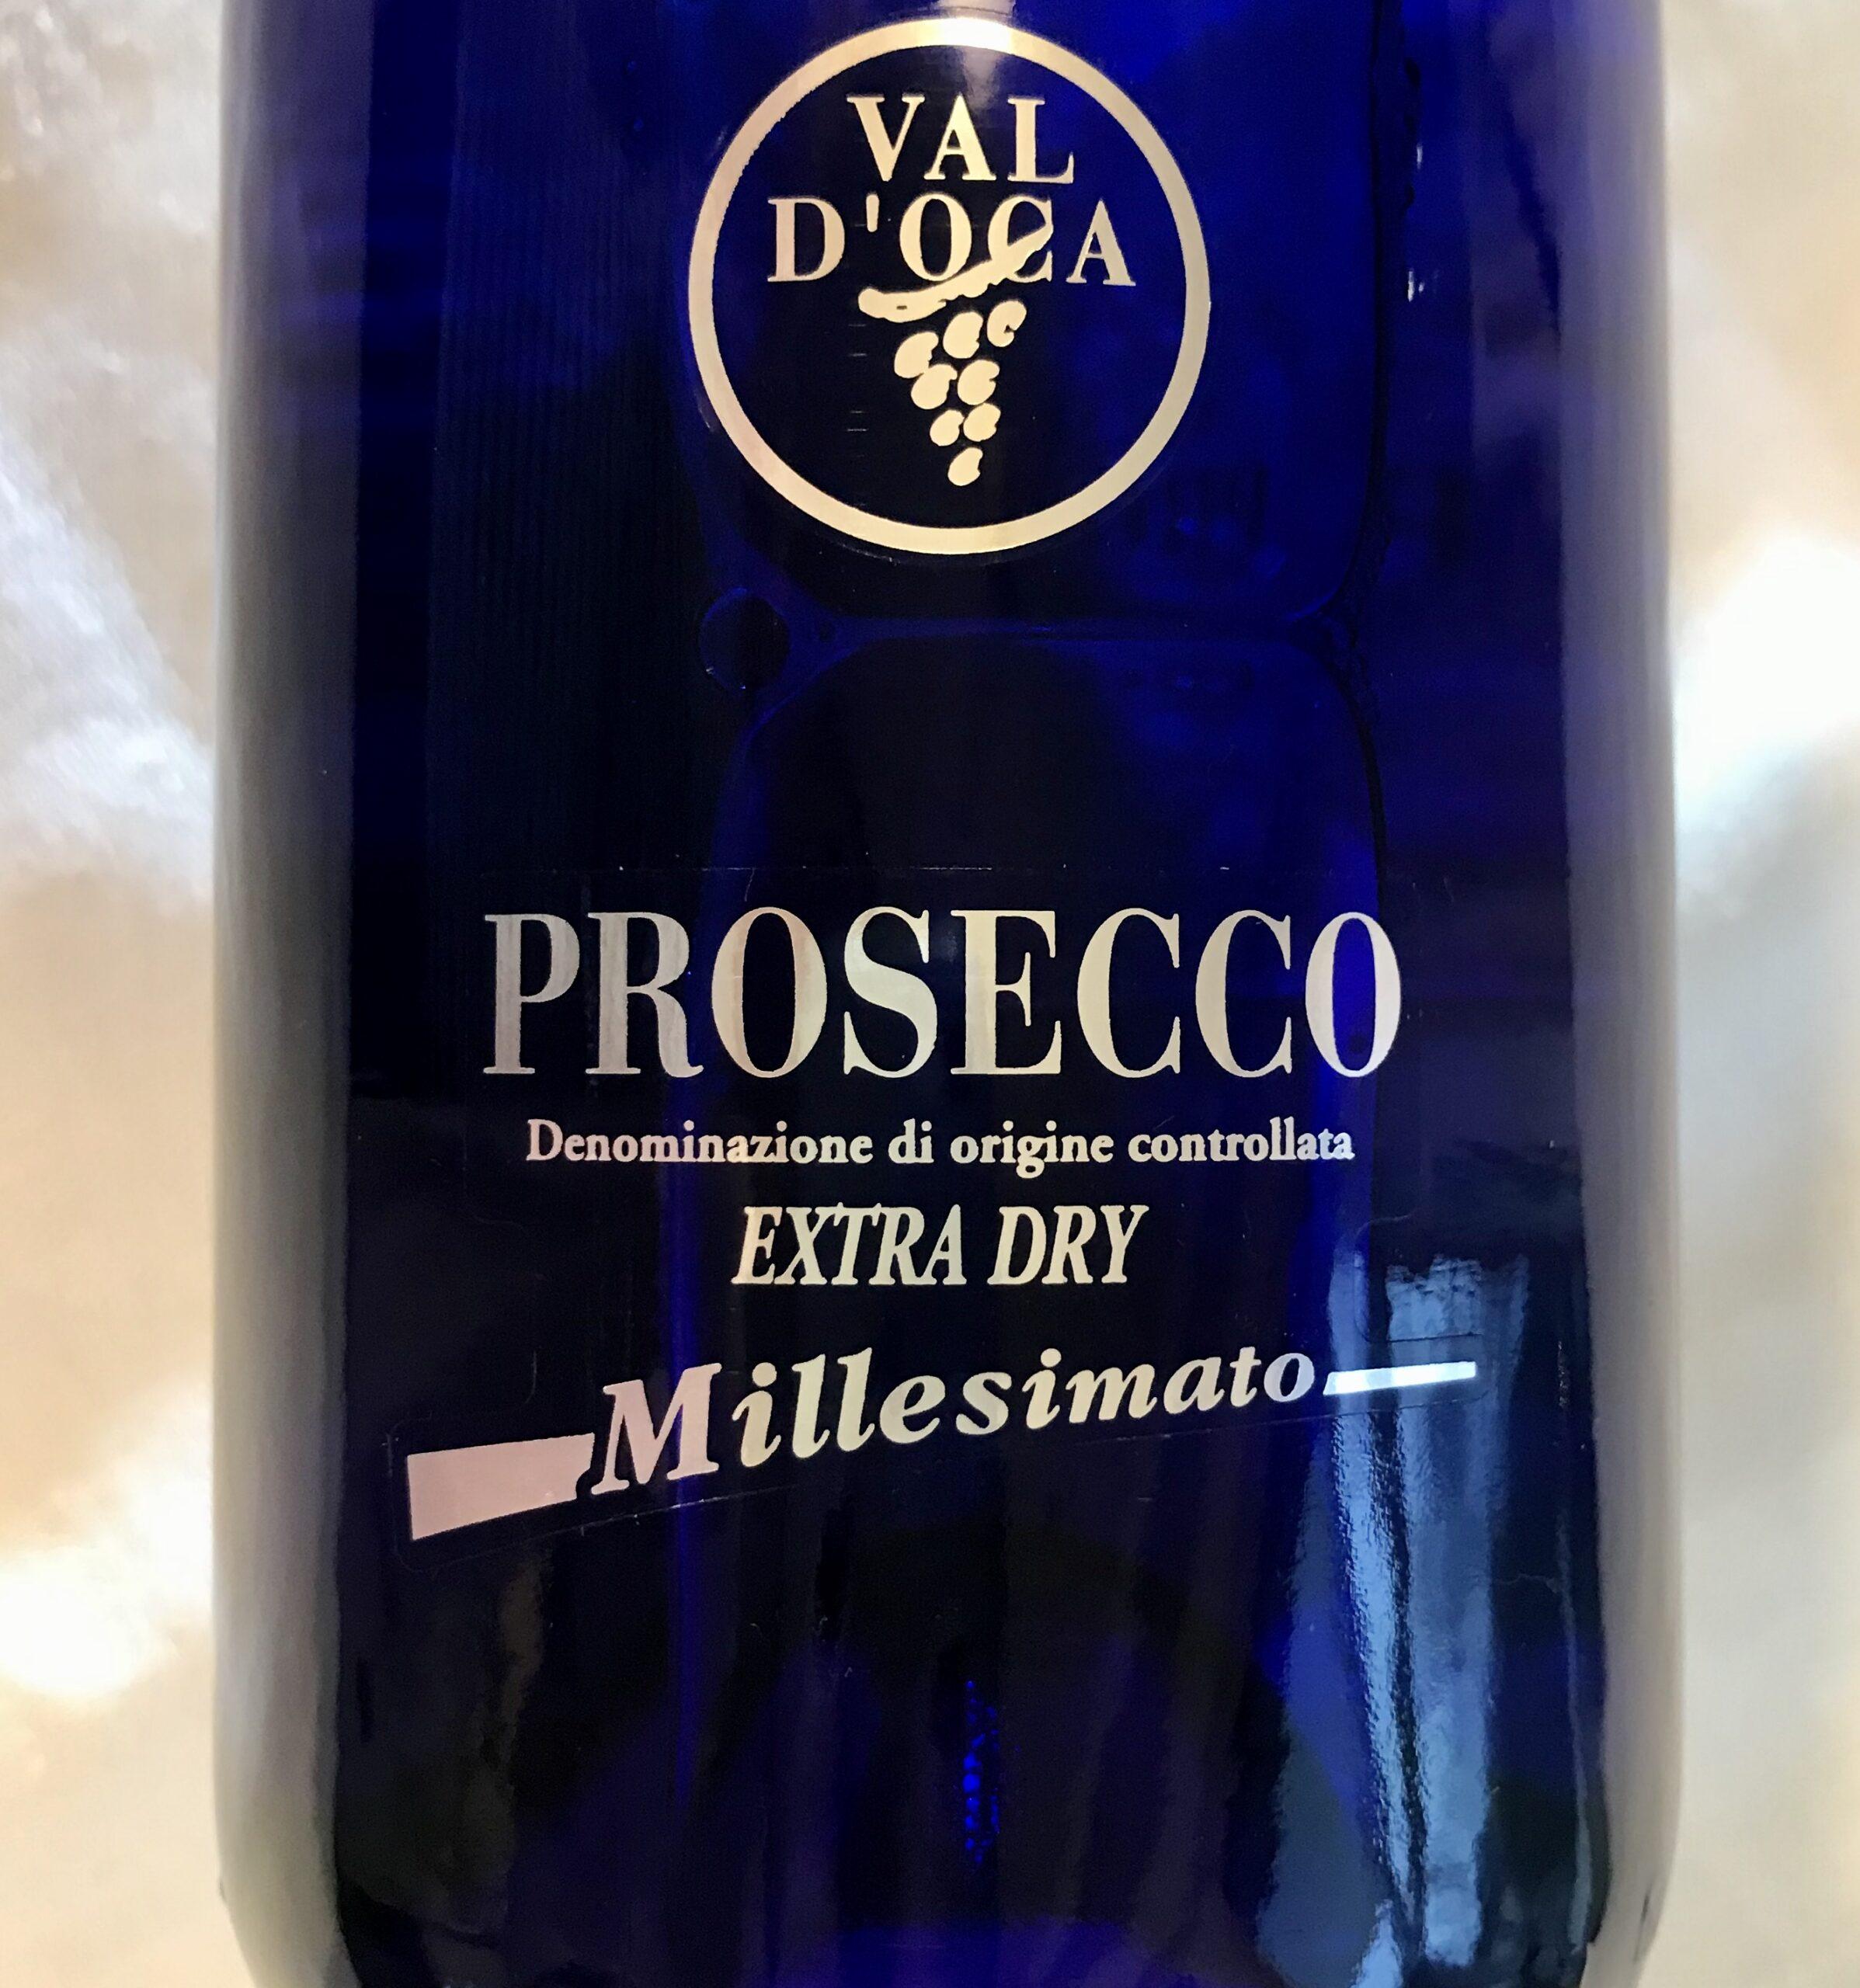 Hyvä Prosecco